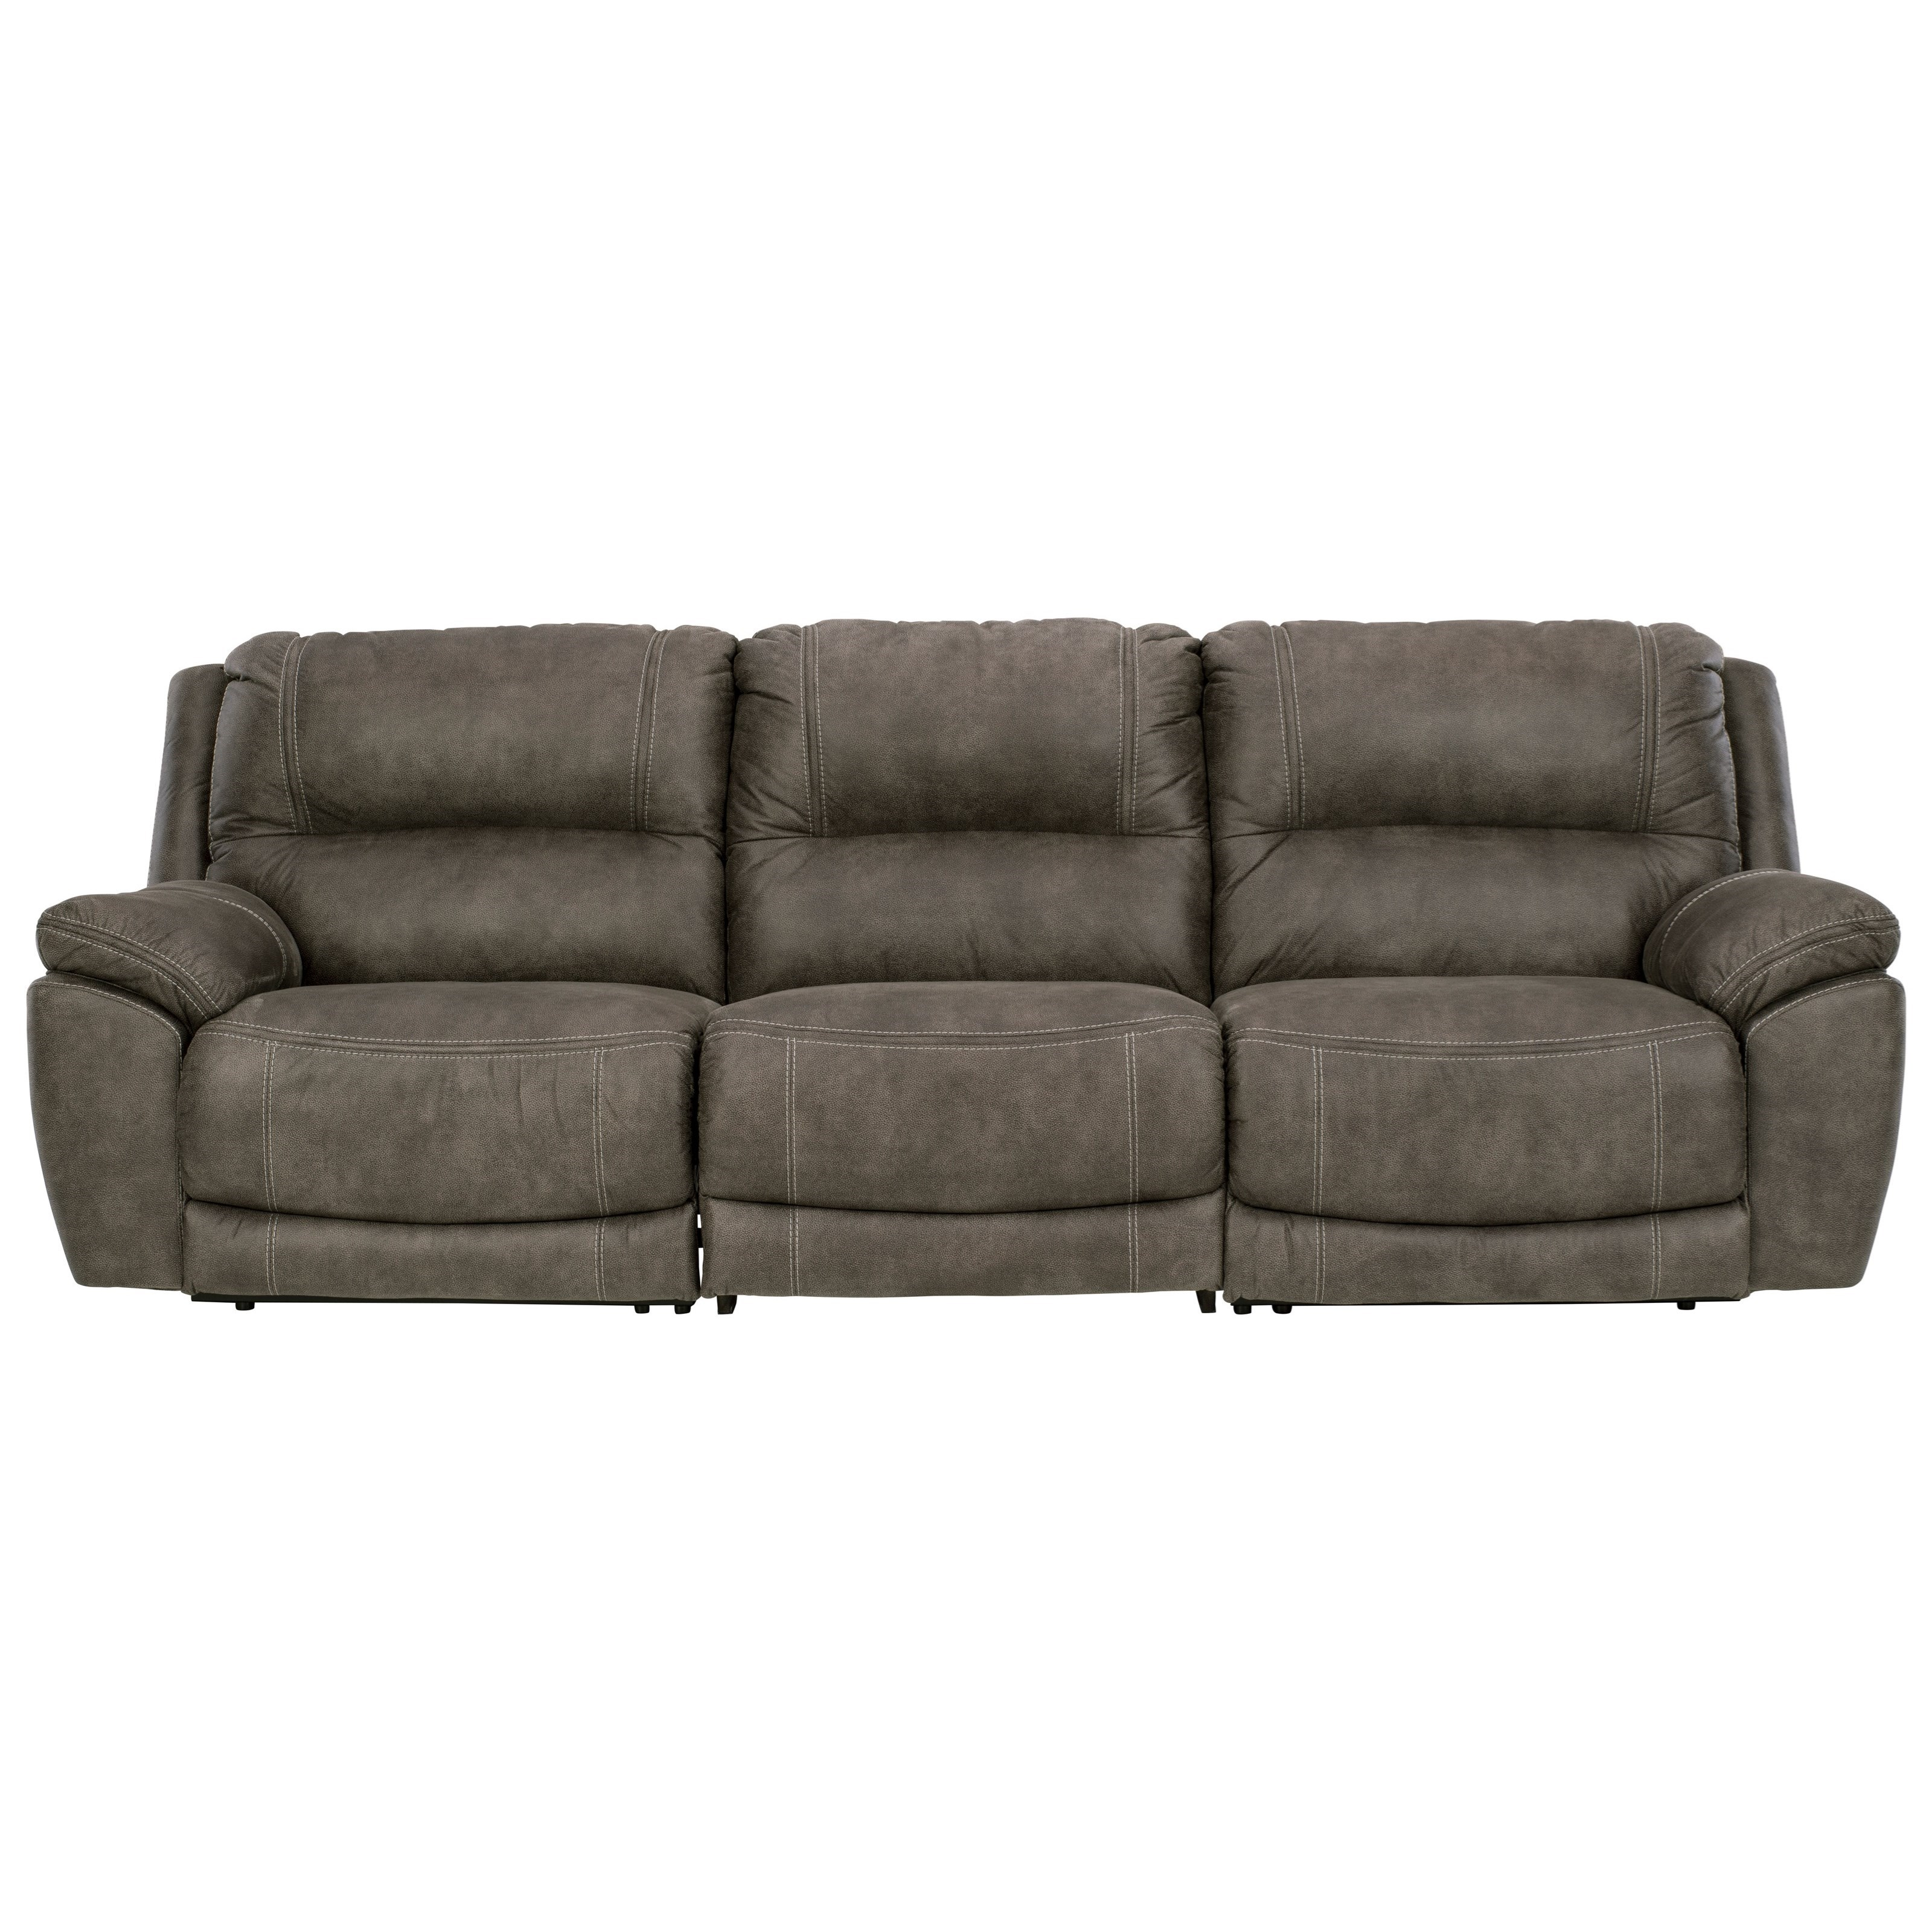 Cranedall Power Reclining Sofa by Ashley (Signature Design) at Johnny Janosik